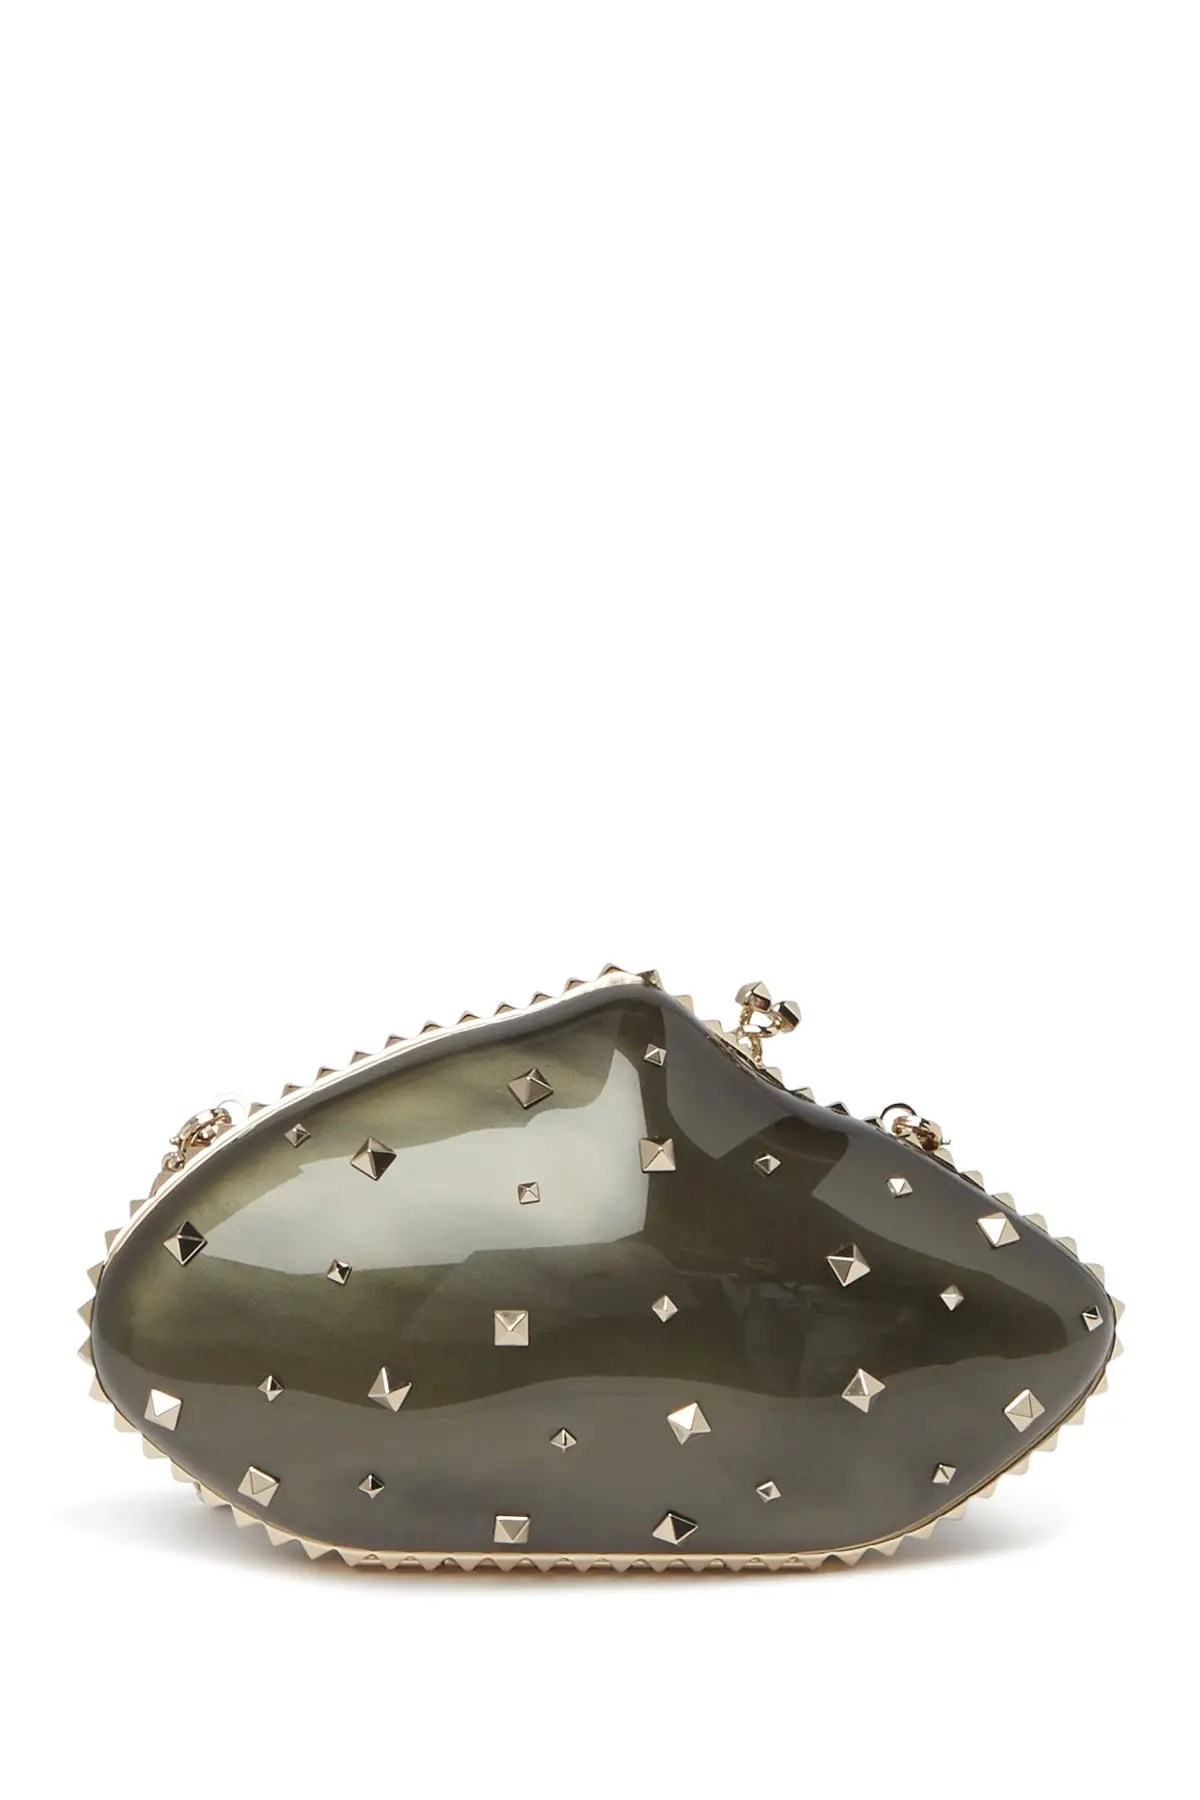 valentino organic shaped hard shell studded clutch nordstrom rack